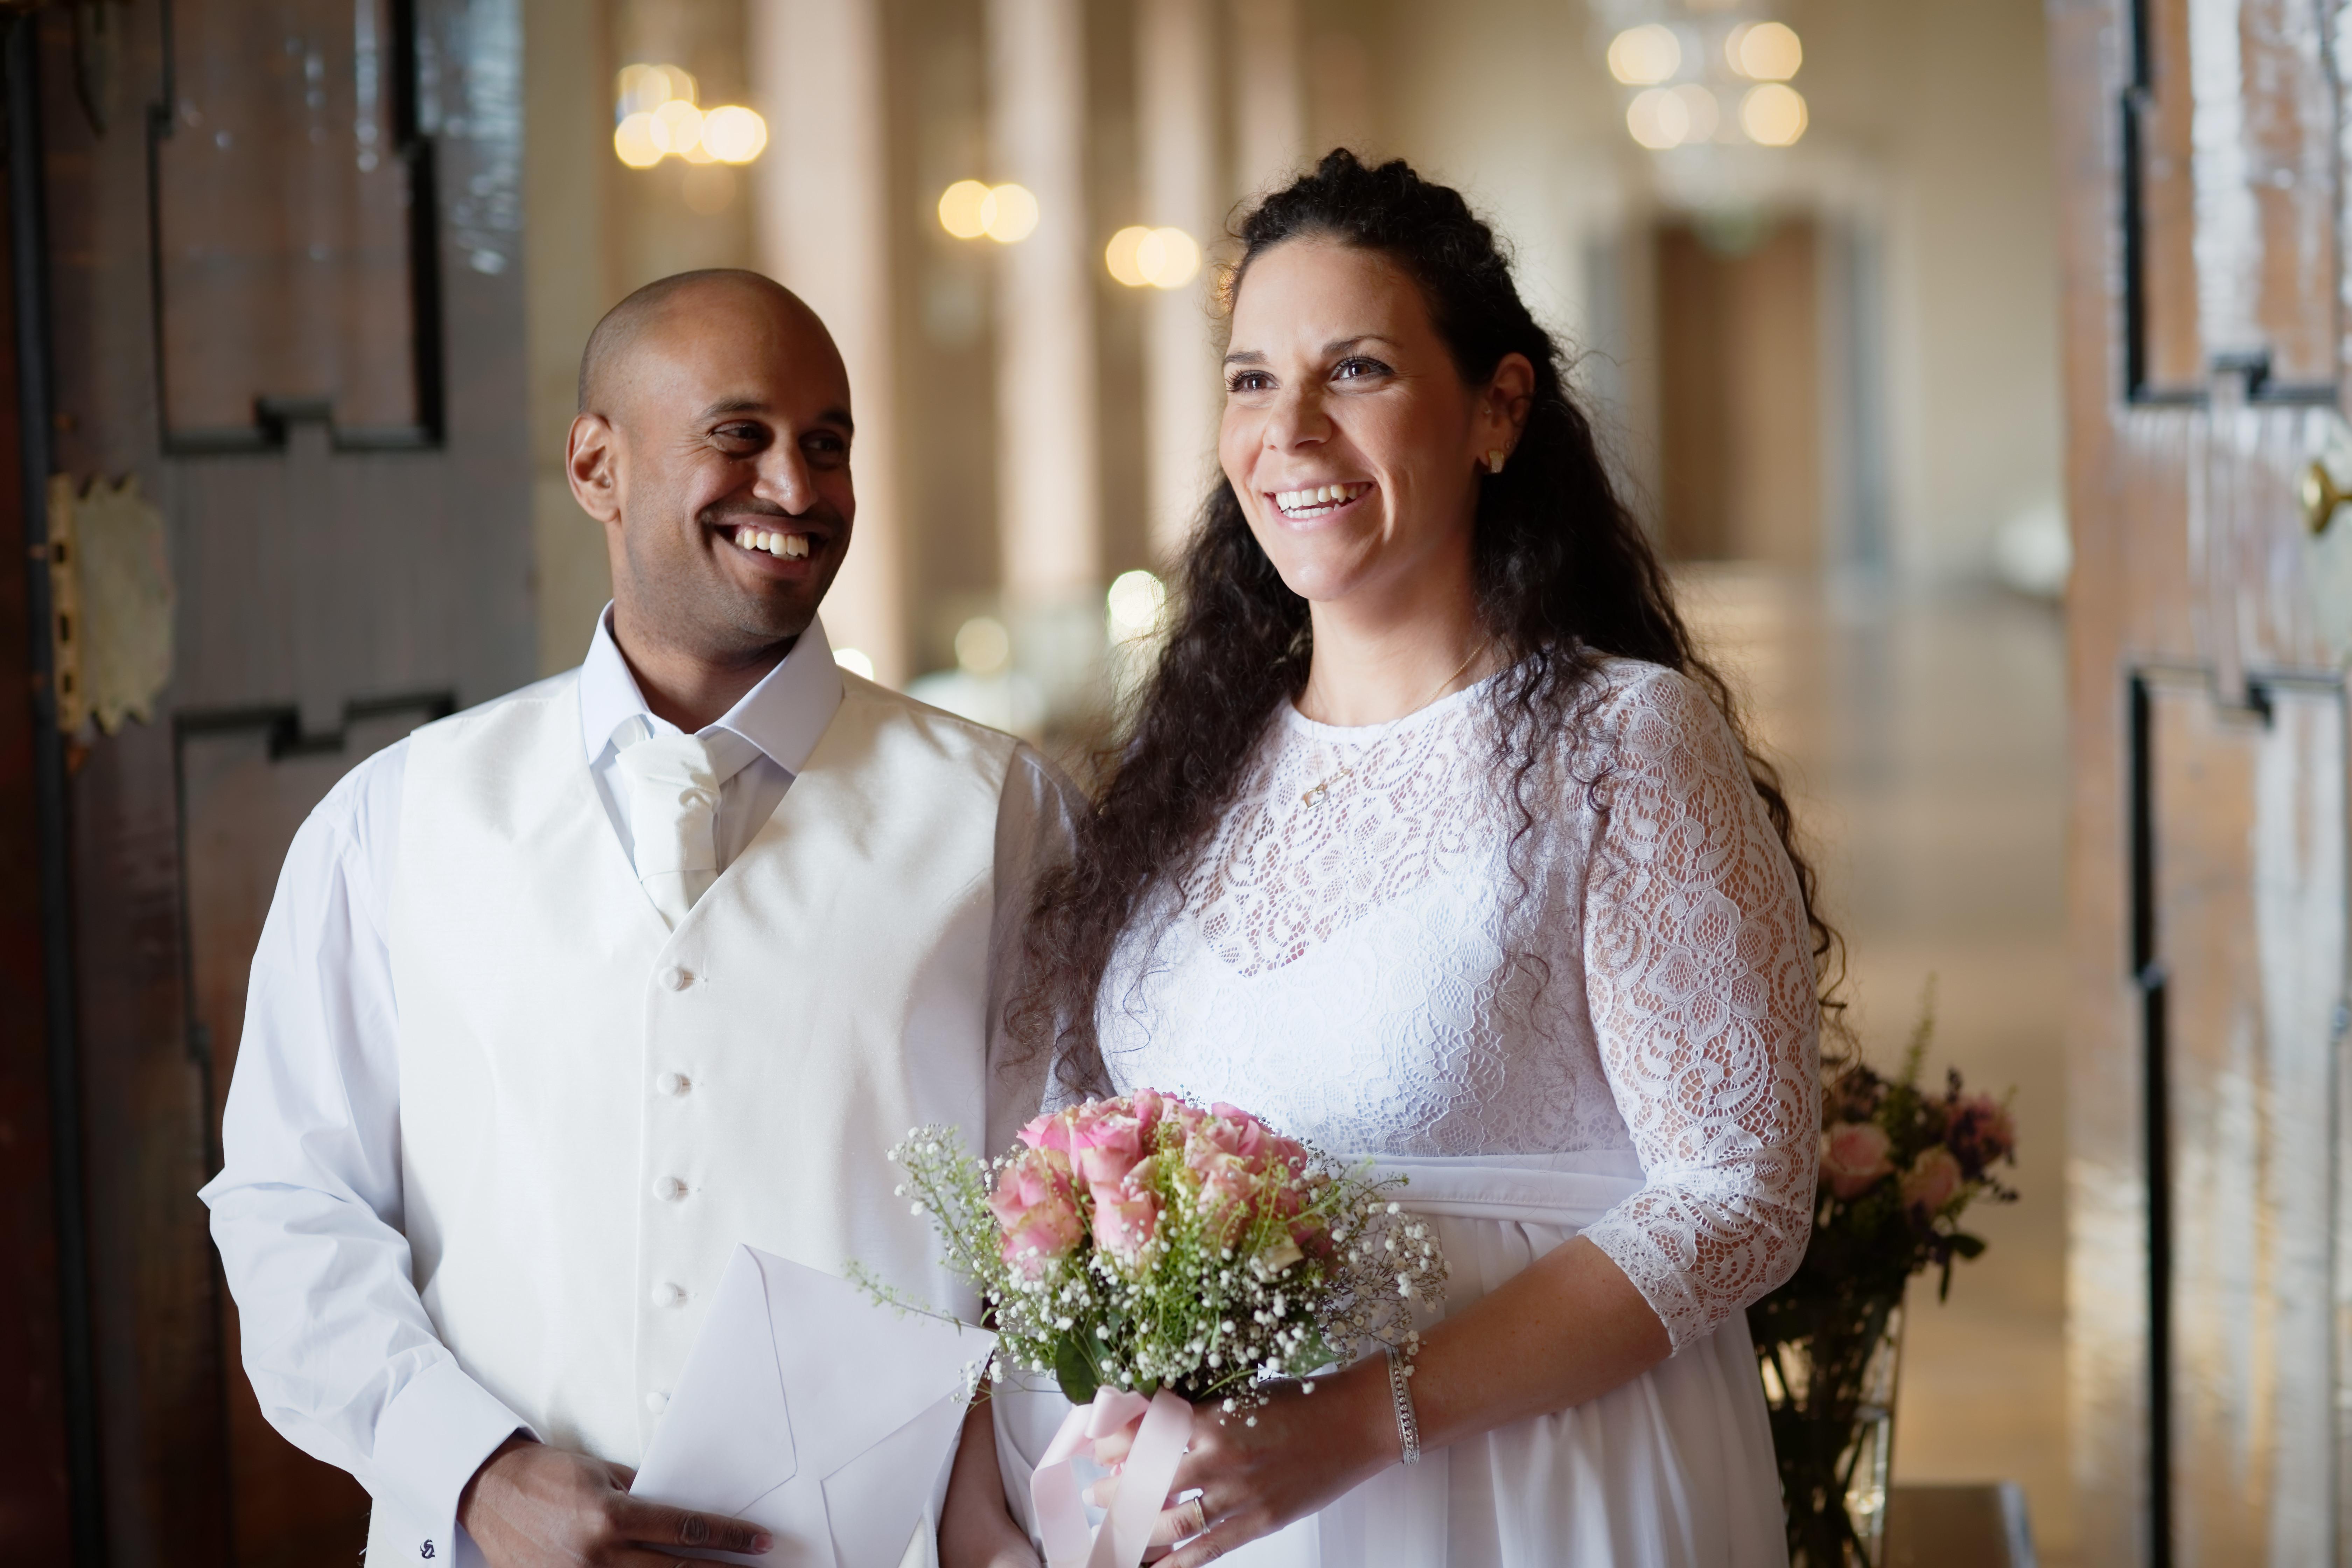 Nygifta sen 30 sekunder